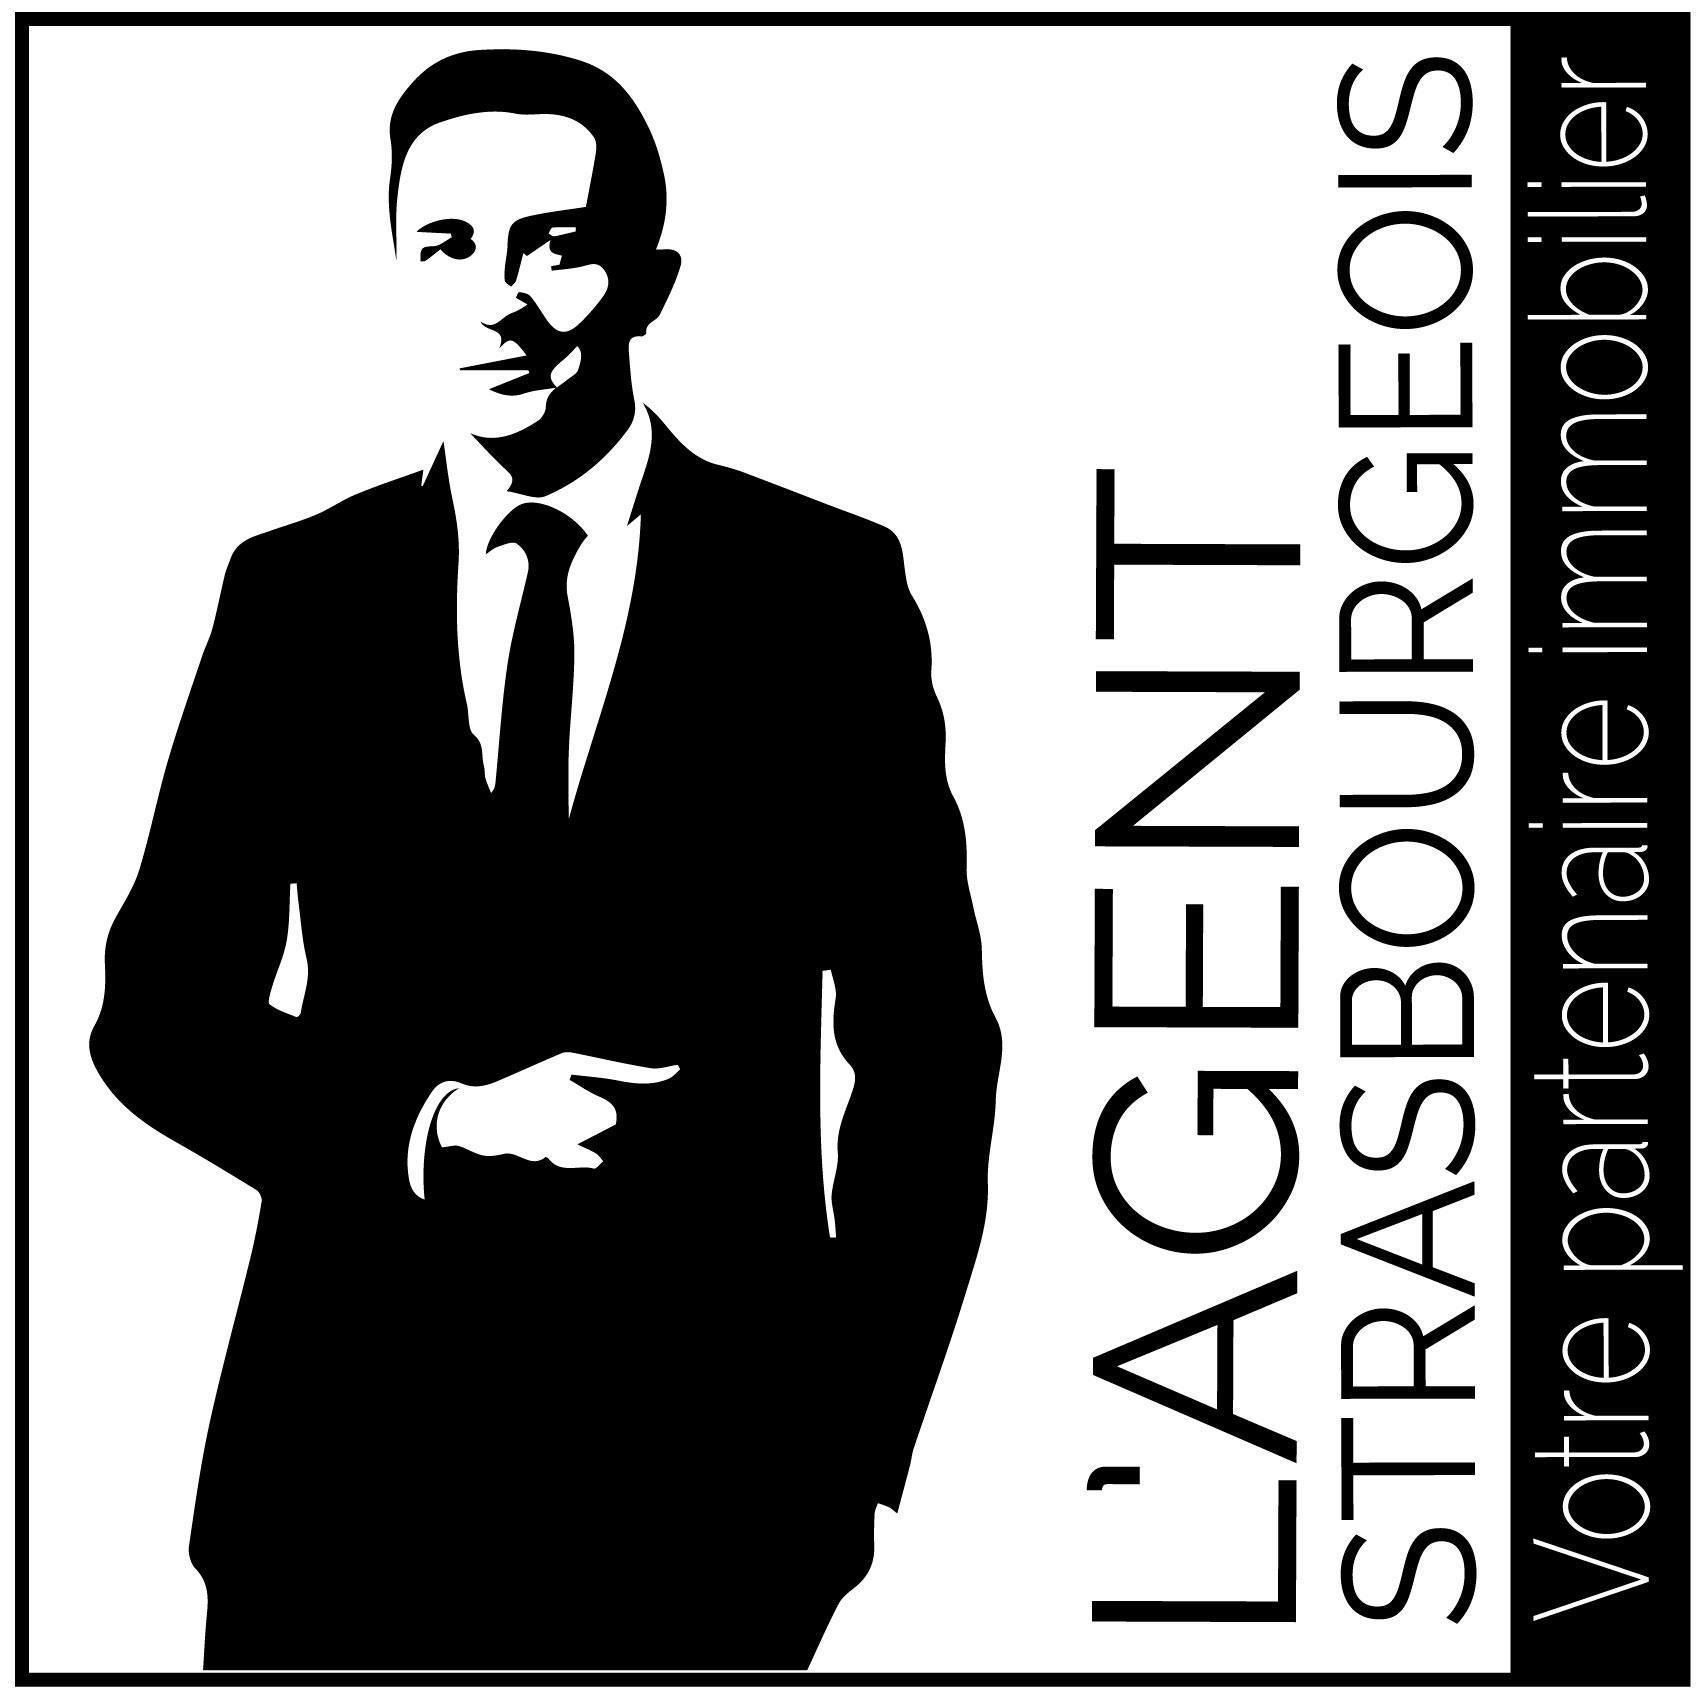 Image de l'agence L'Agent Strasbourgeois